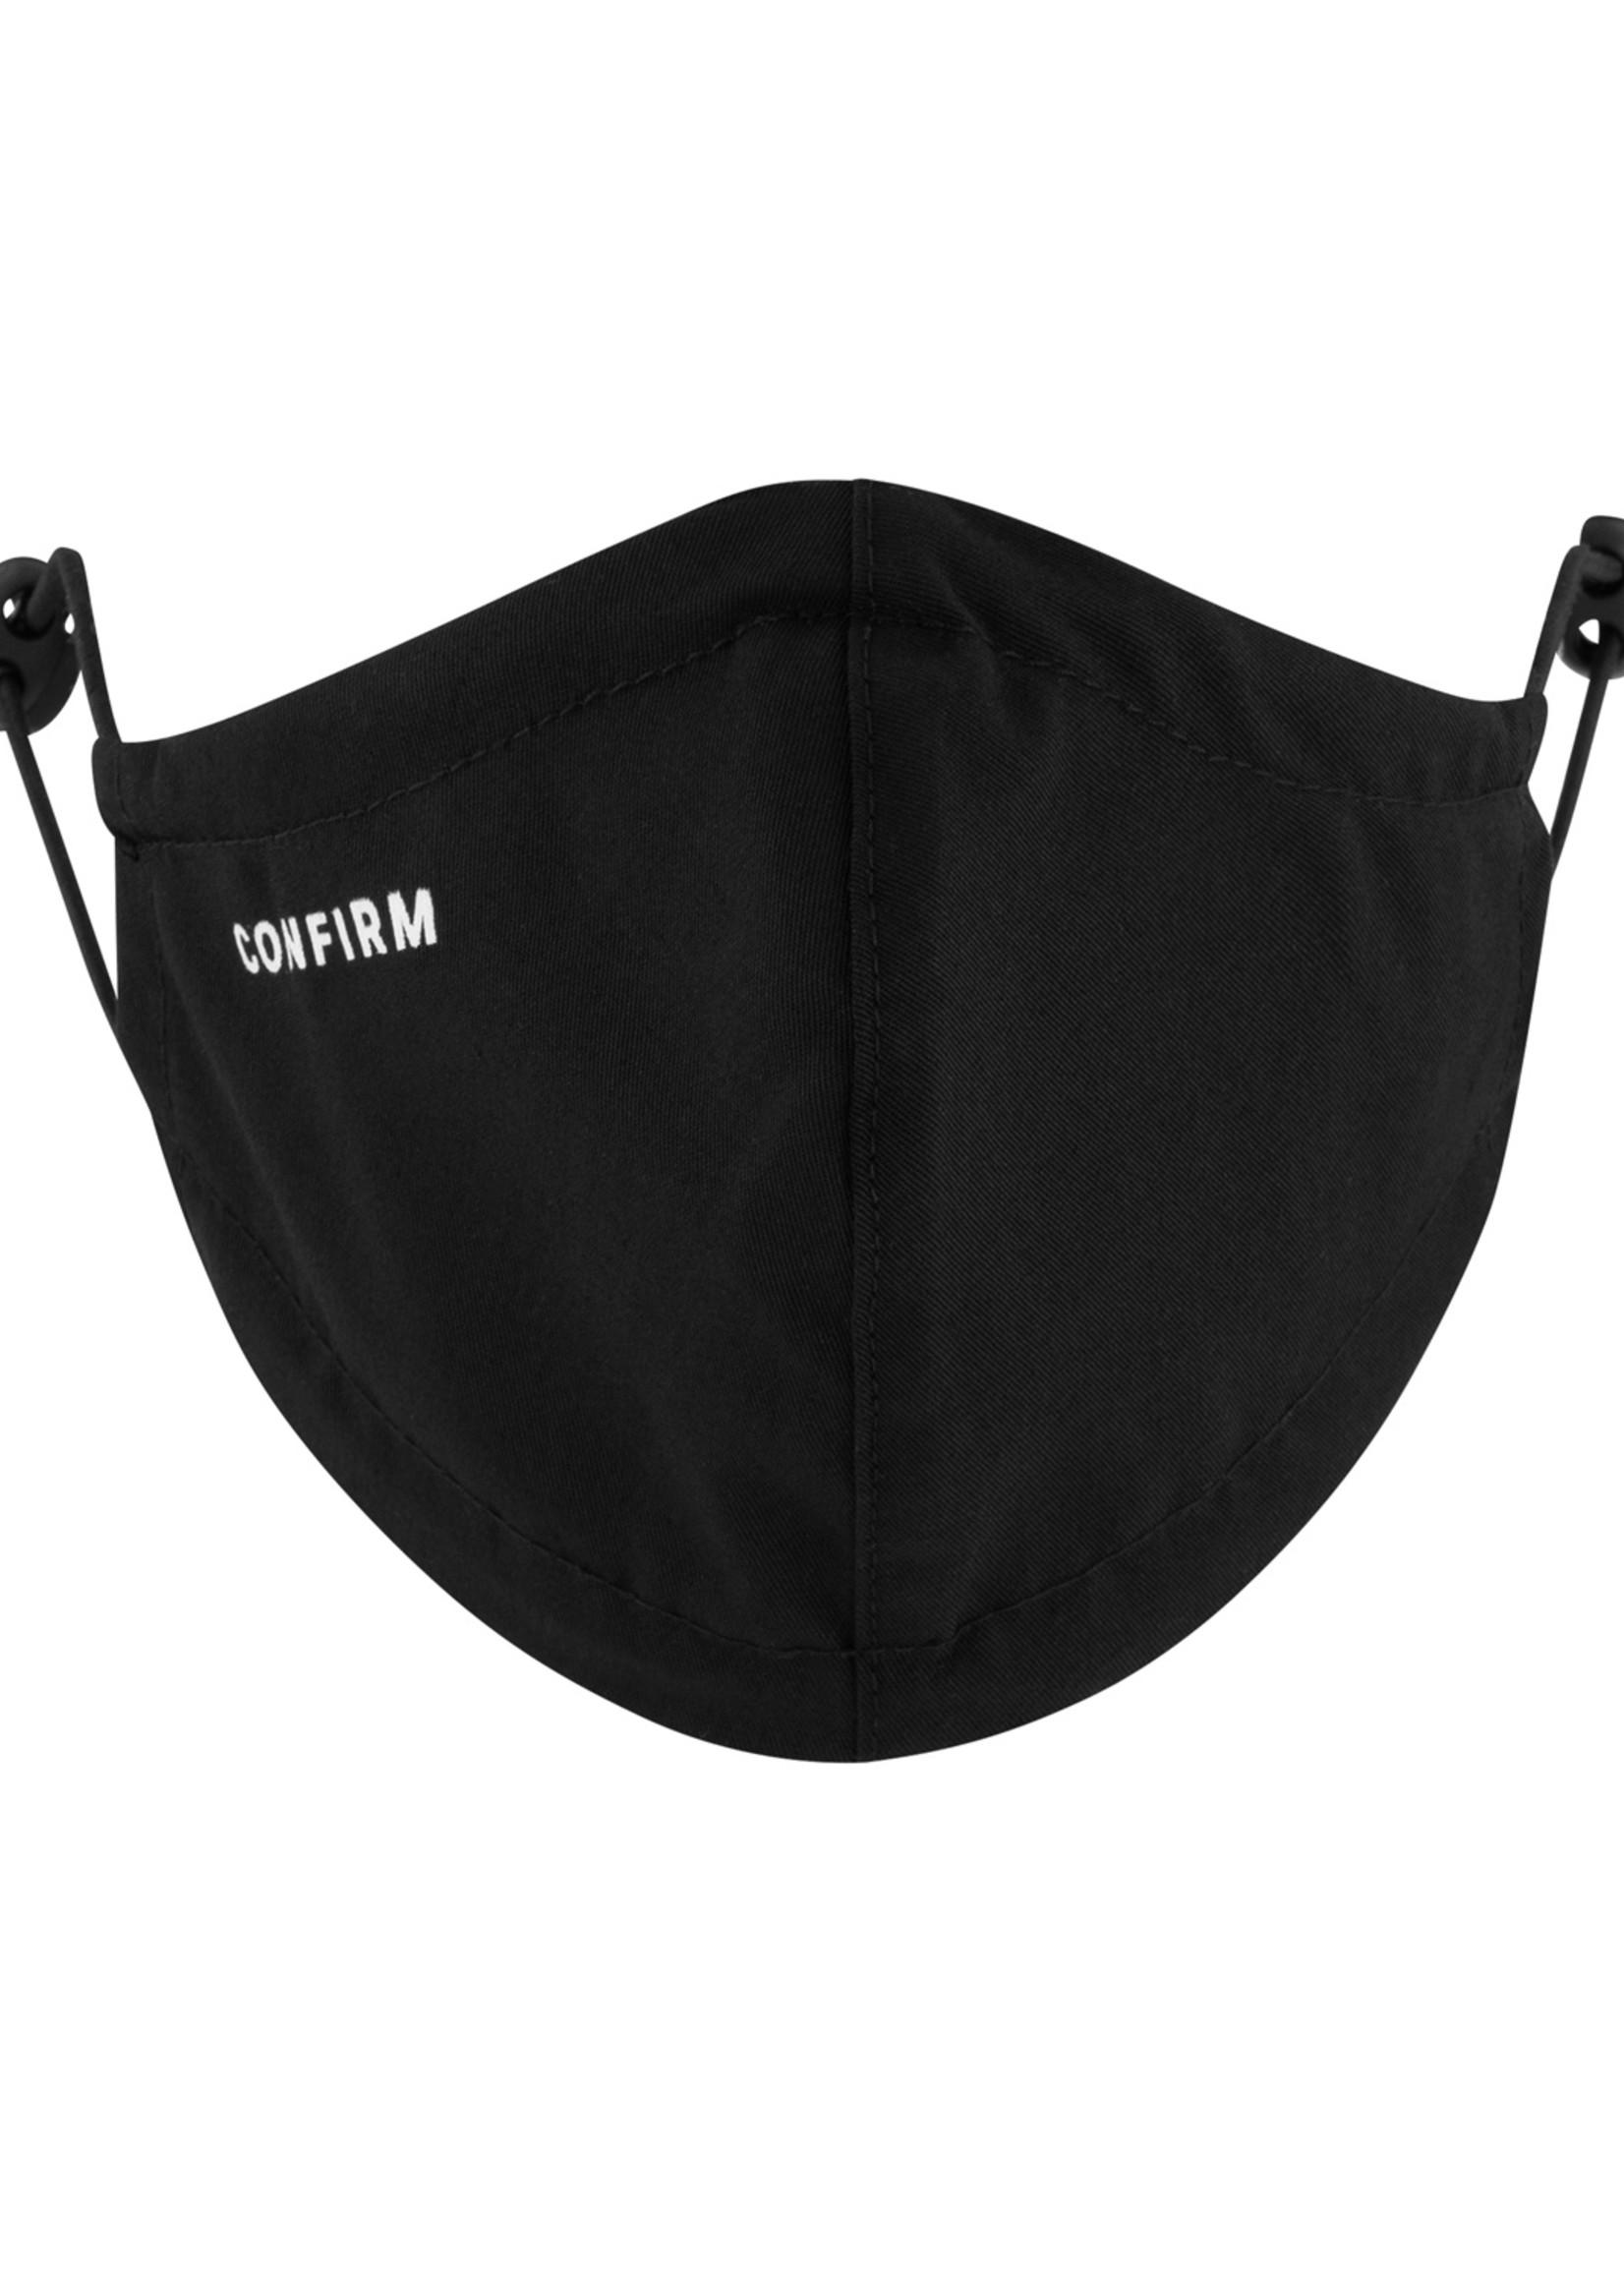 Confirm mondmasker set van 2 - zwart/wit